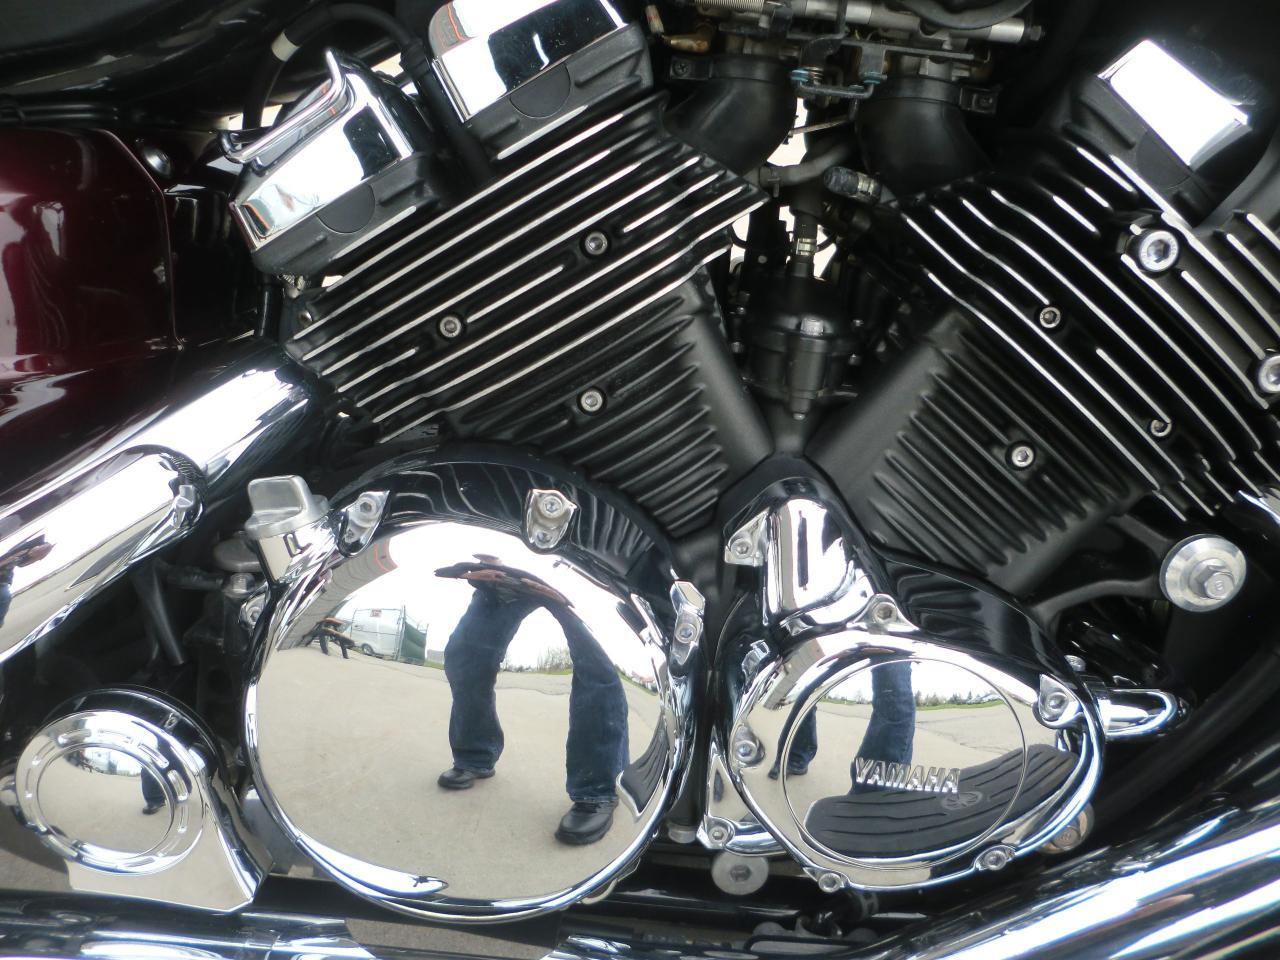 2008 Yamaha RSVENTURE